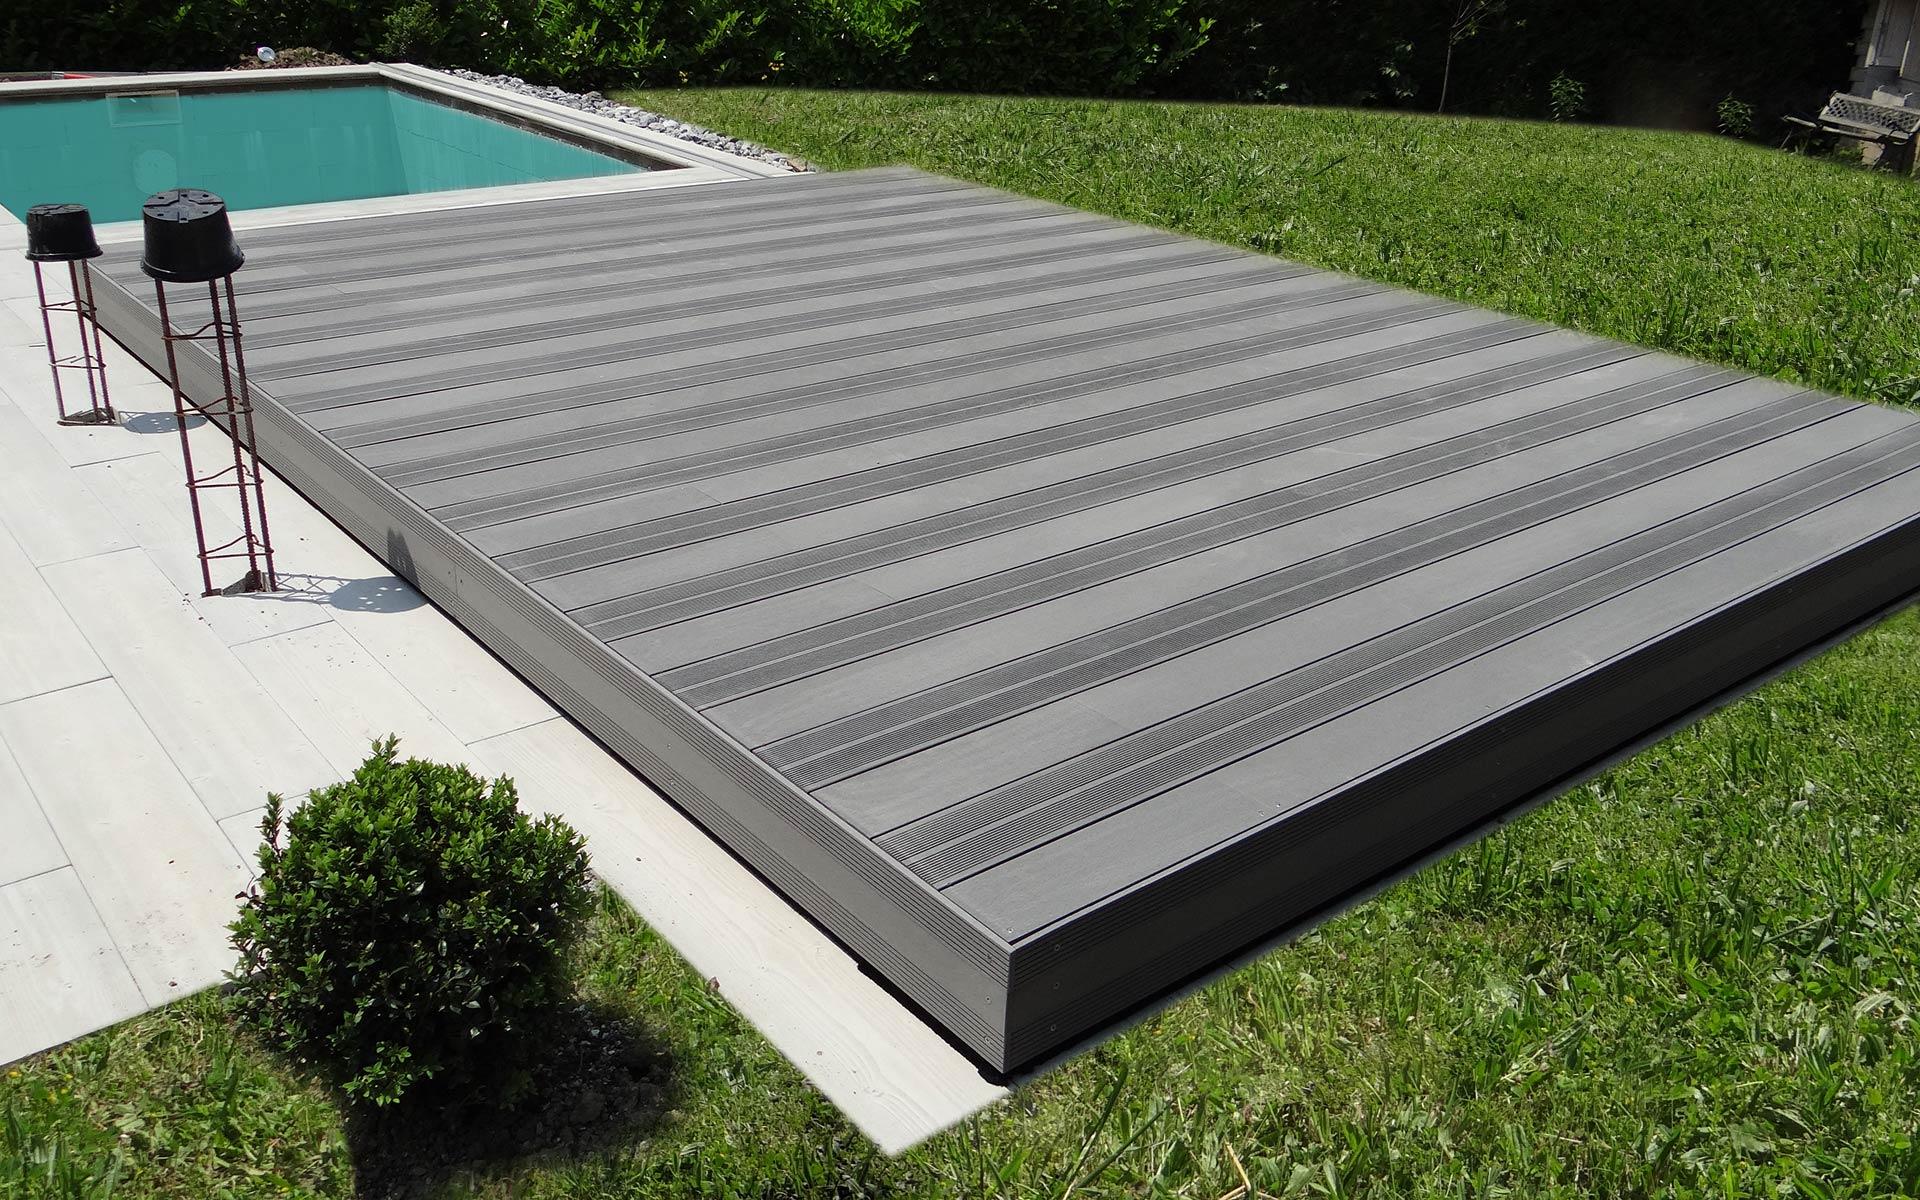 Terrasse mobile pour piscine hidden pool hidden pool for Couverture de piscine rigide